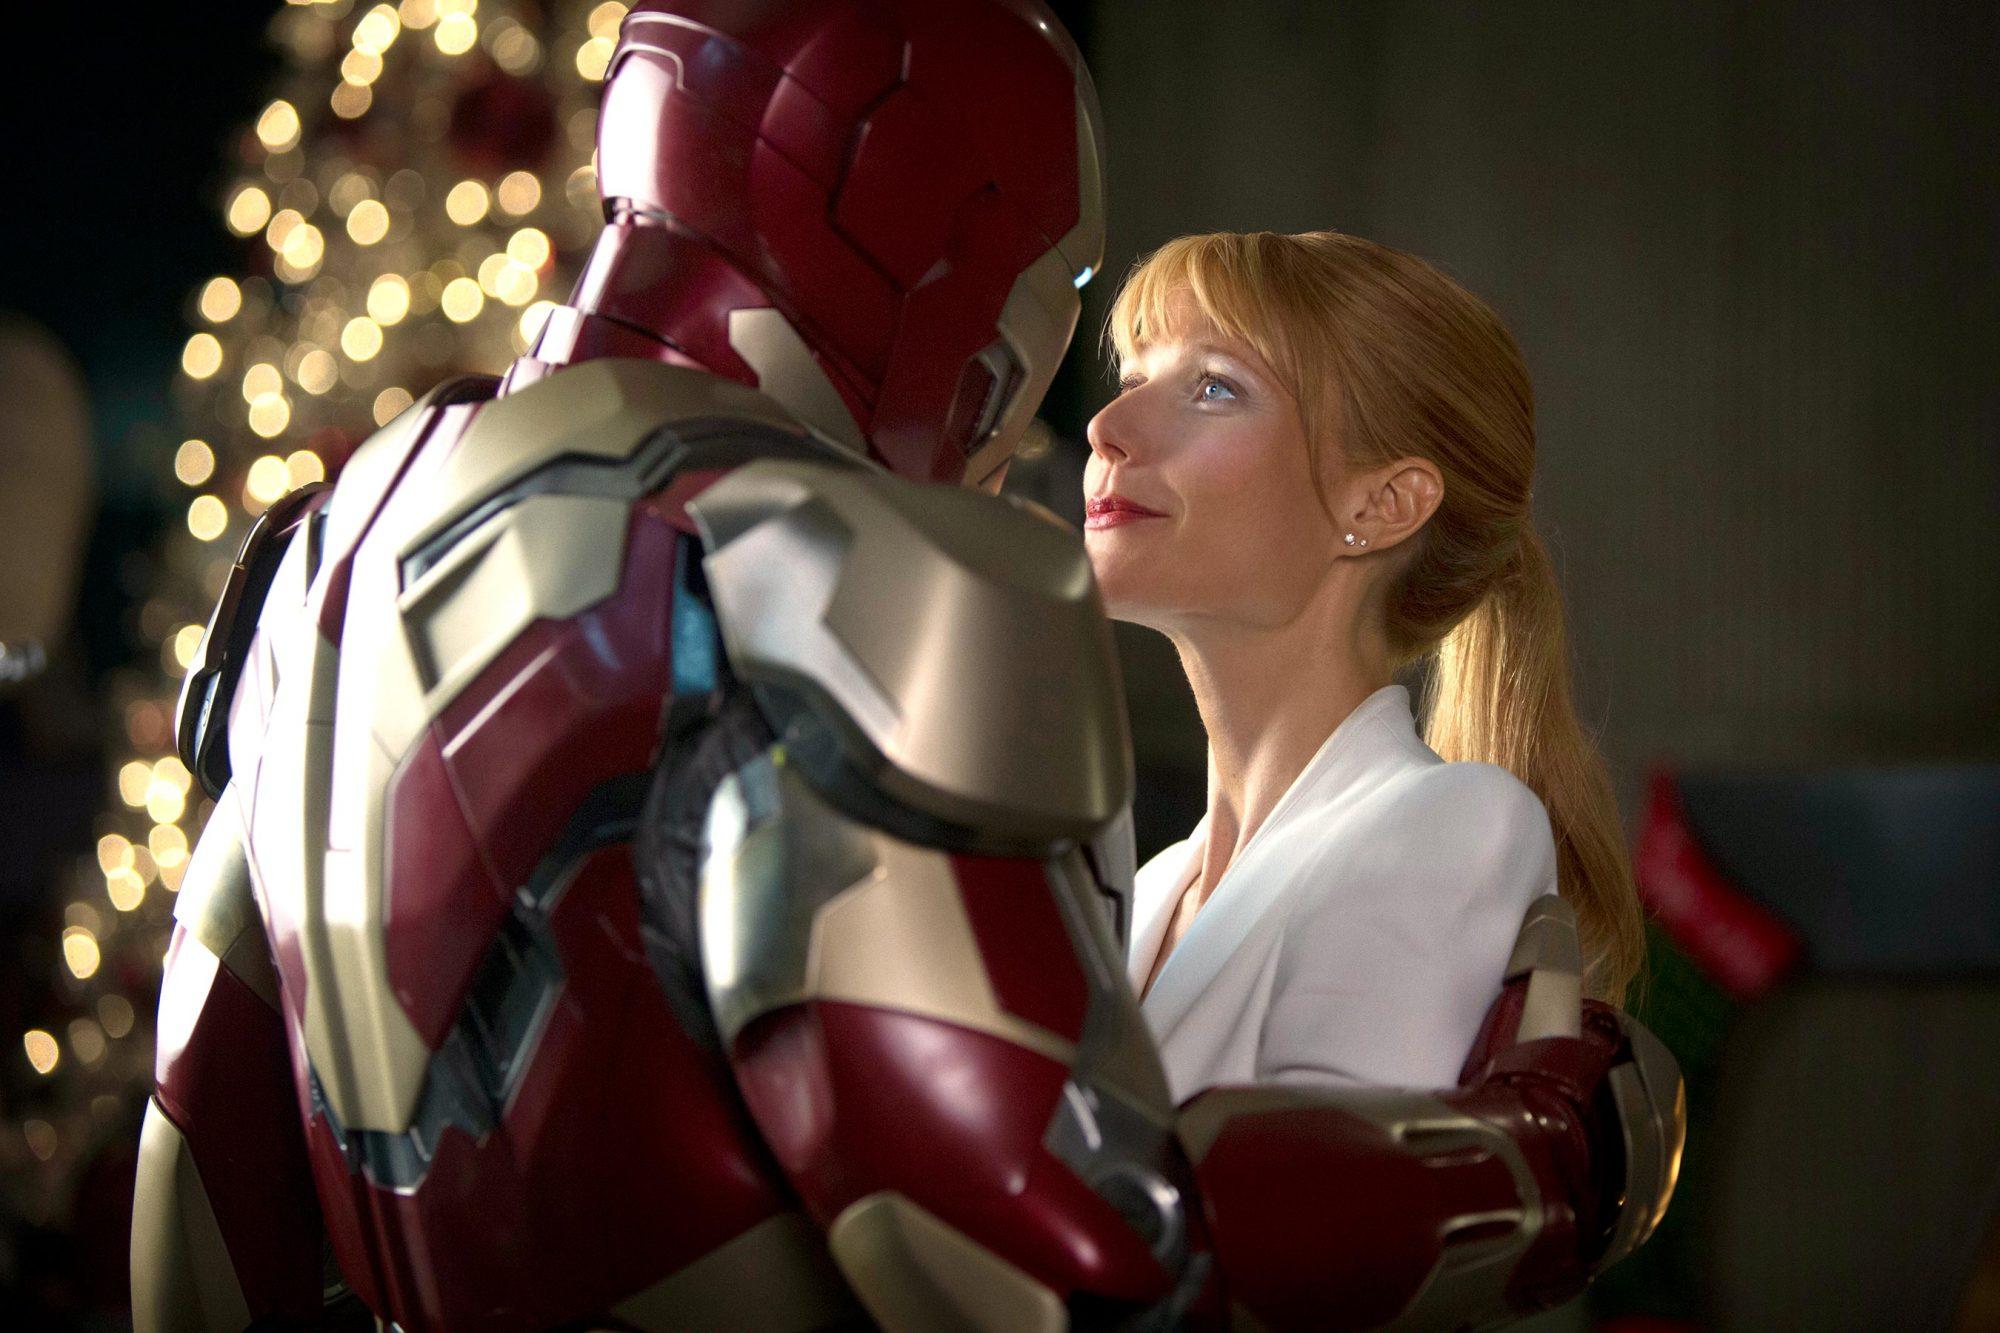 Iron Man 3 (2013)Tony Stark / Iron Man (Robert Downey Jr.) and Gwyneth Paltrow